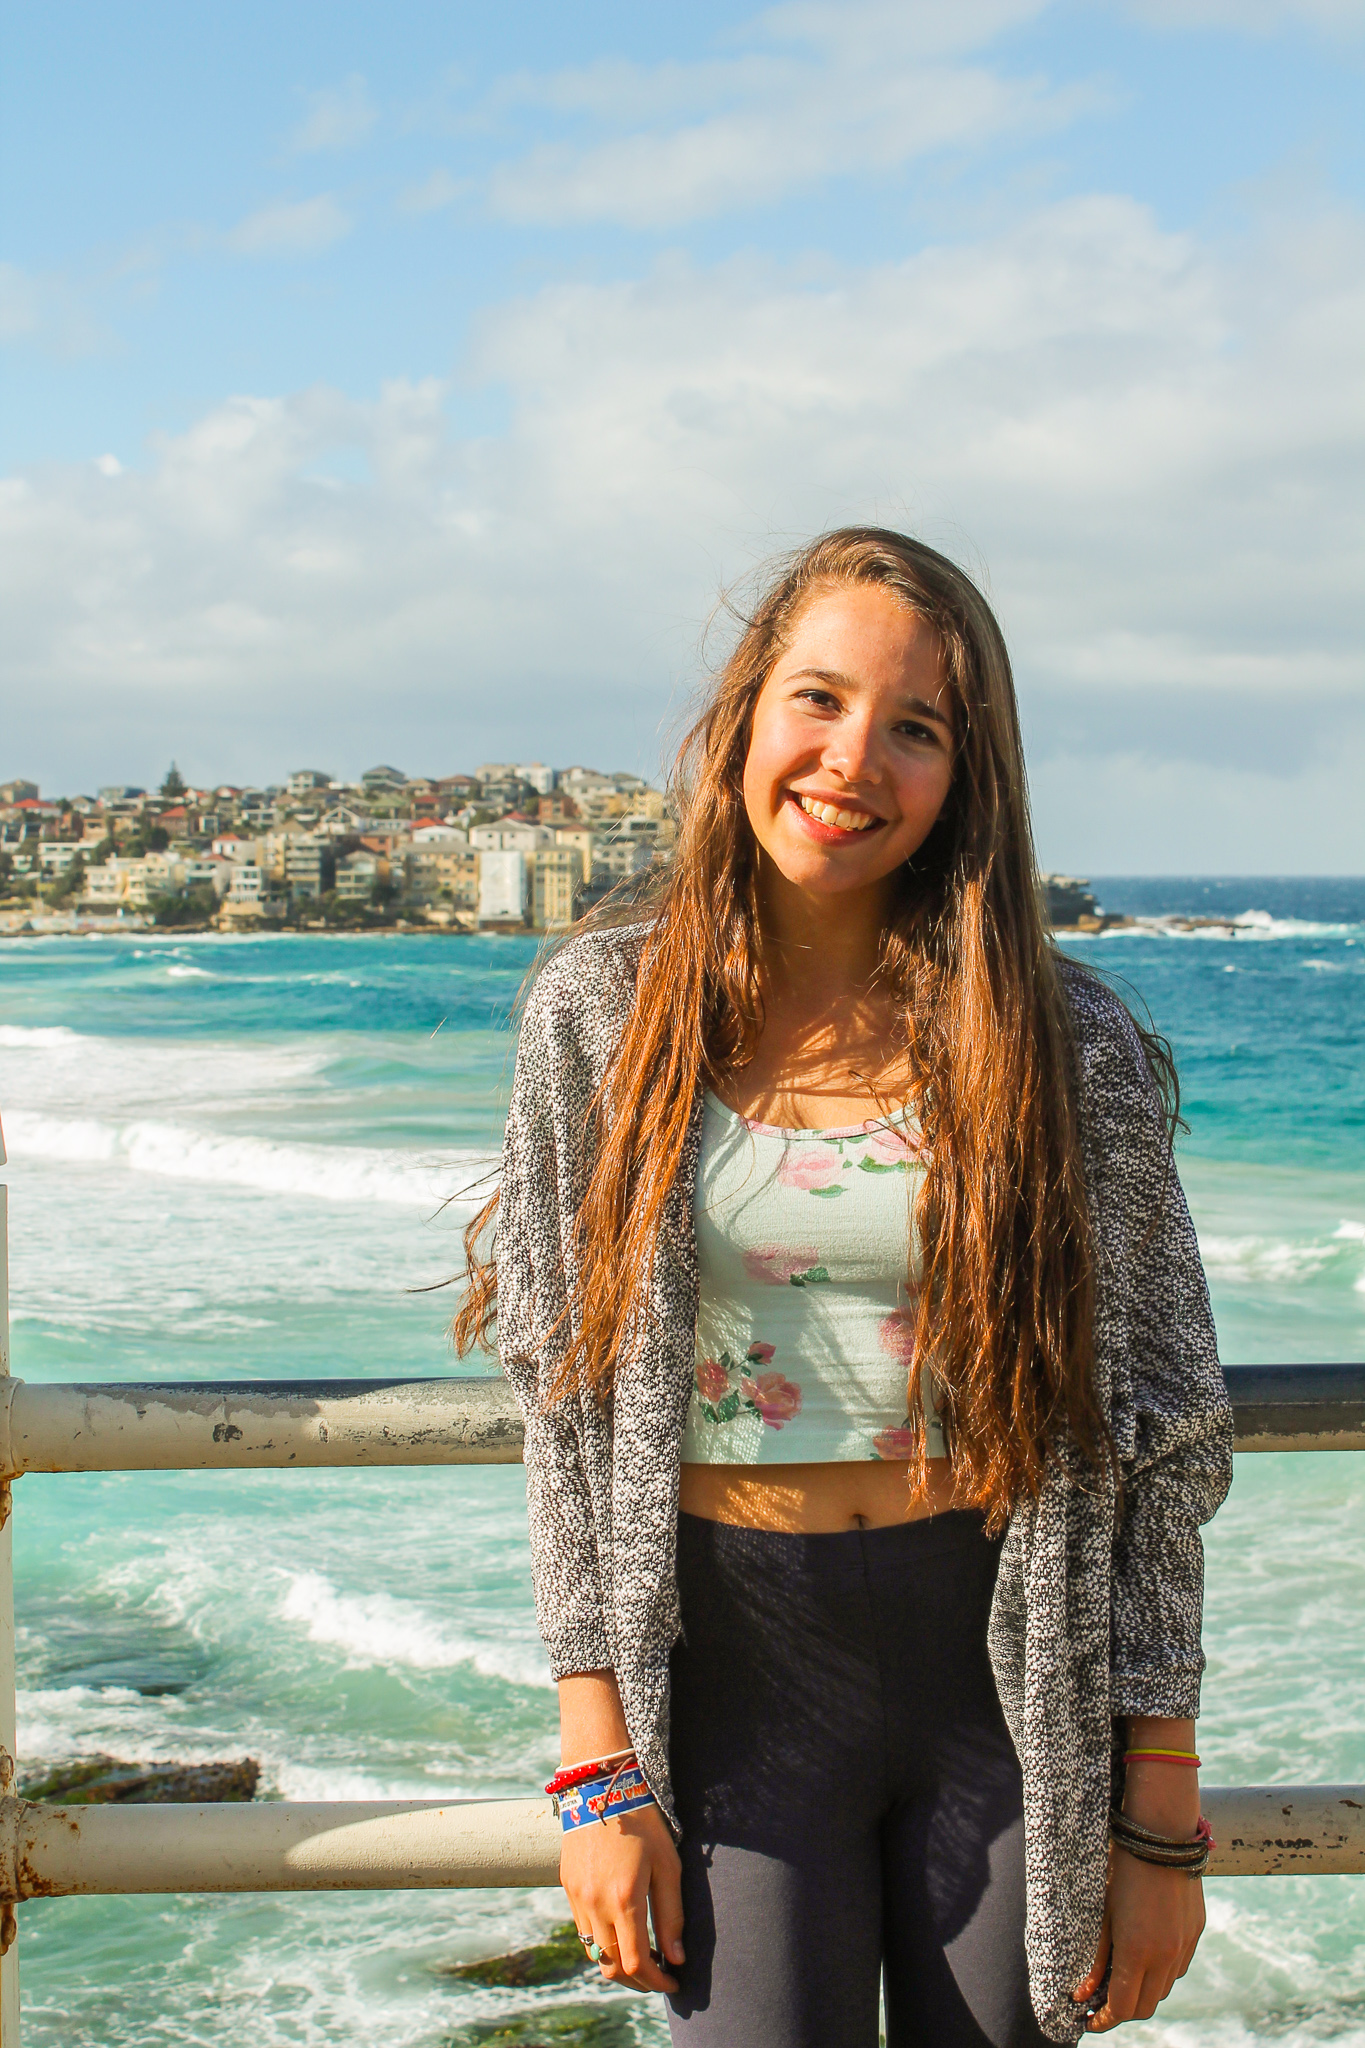 Summer Program - Promoting Volunteerism | Travel For Teens: Australia Service and Adventure